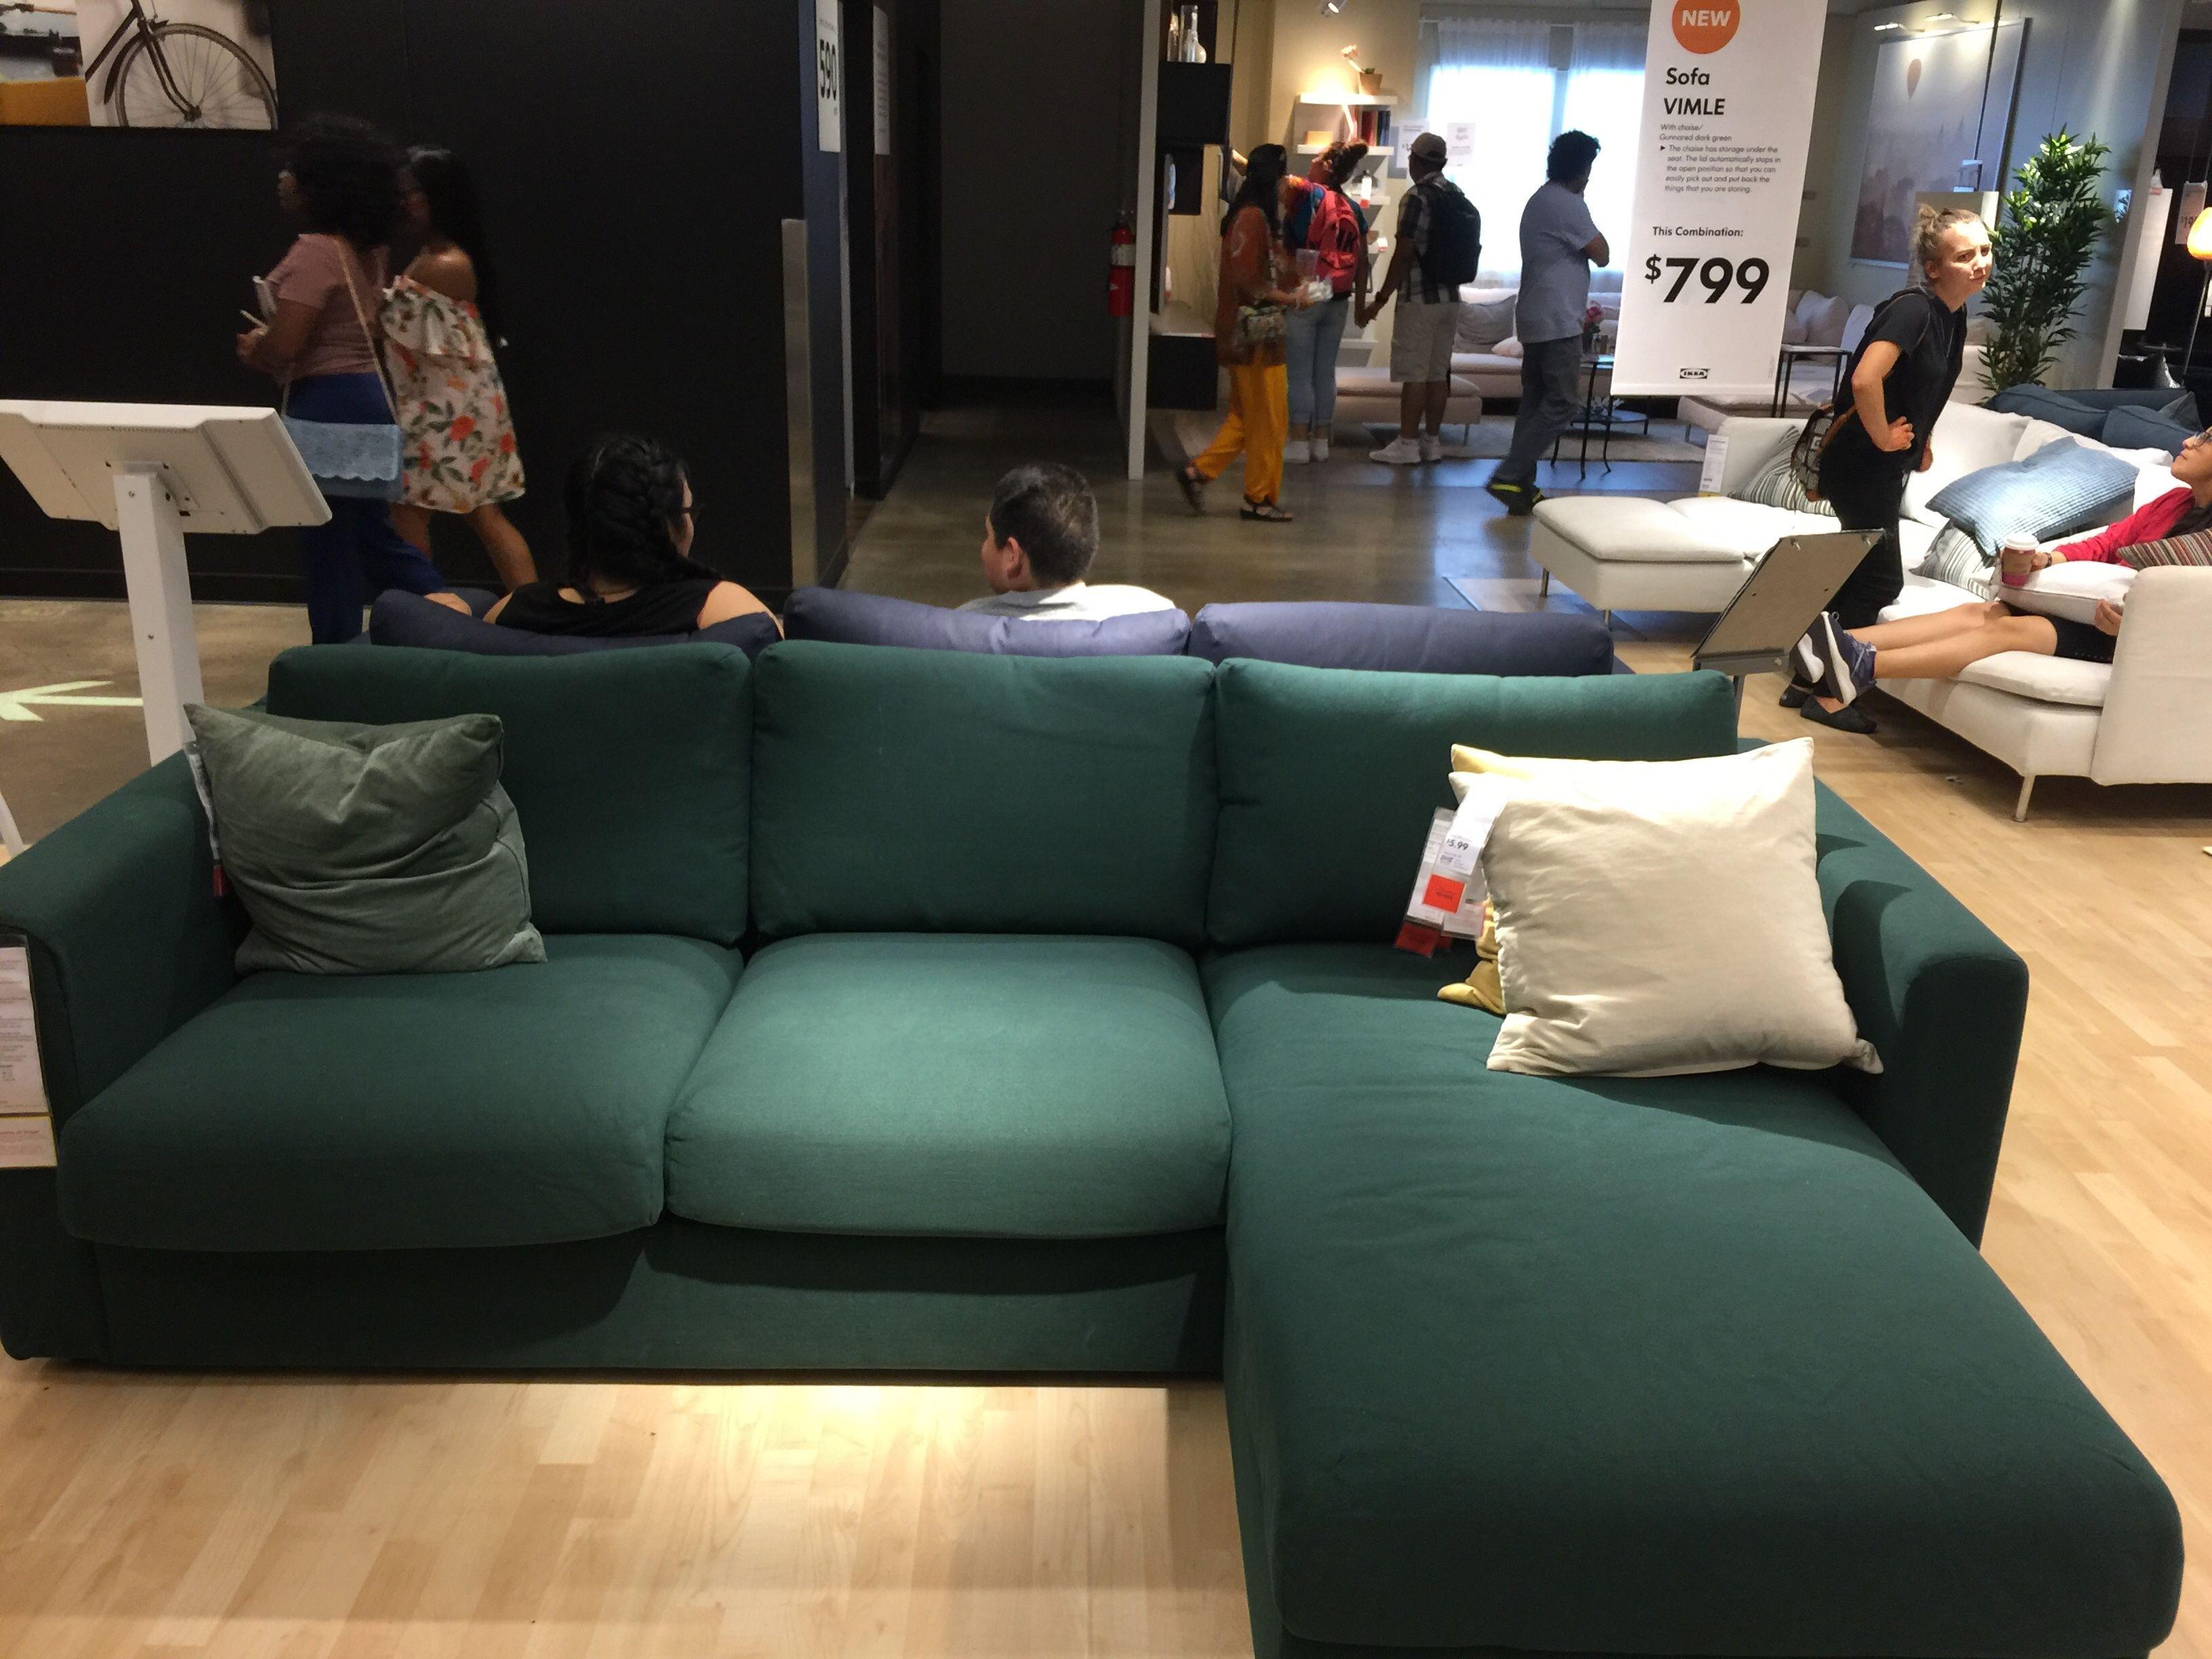 Divan Hemnes Ikea Inspirant Photos Lit Divan Ikea Meilleur Hemnes Lit D Appoint Home Pinterest S